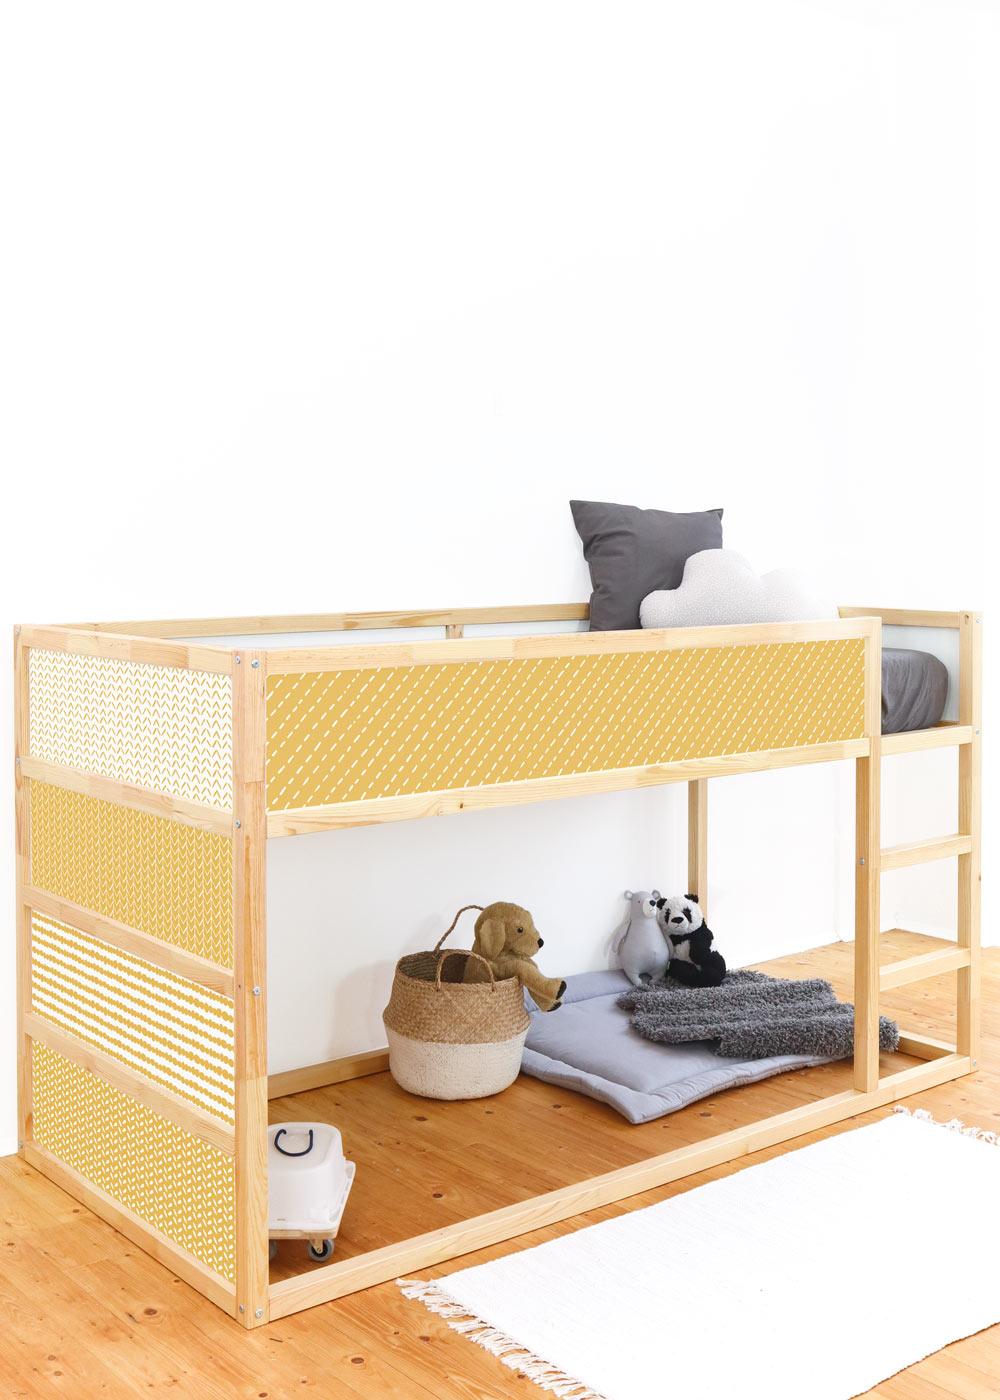 Ikea Kuras Hochbett Musta senf Gesamtansicht